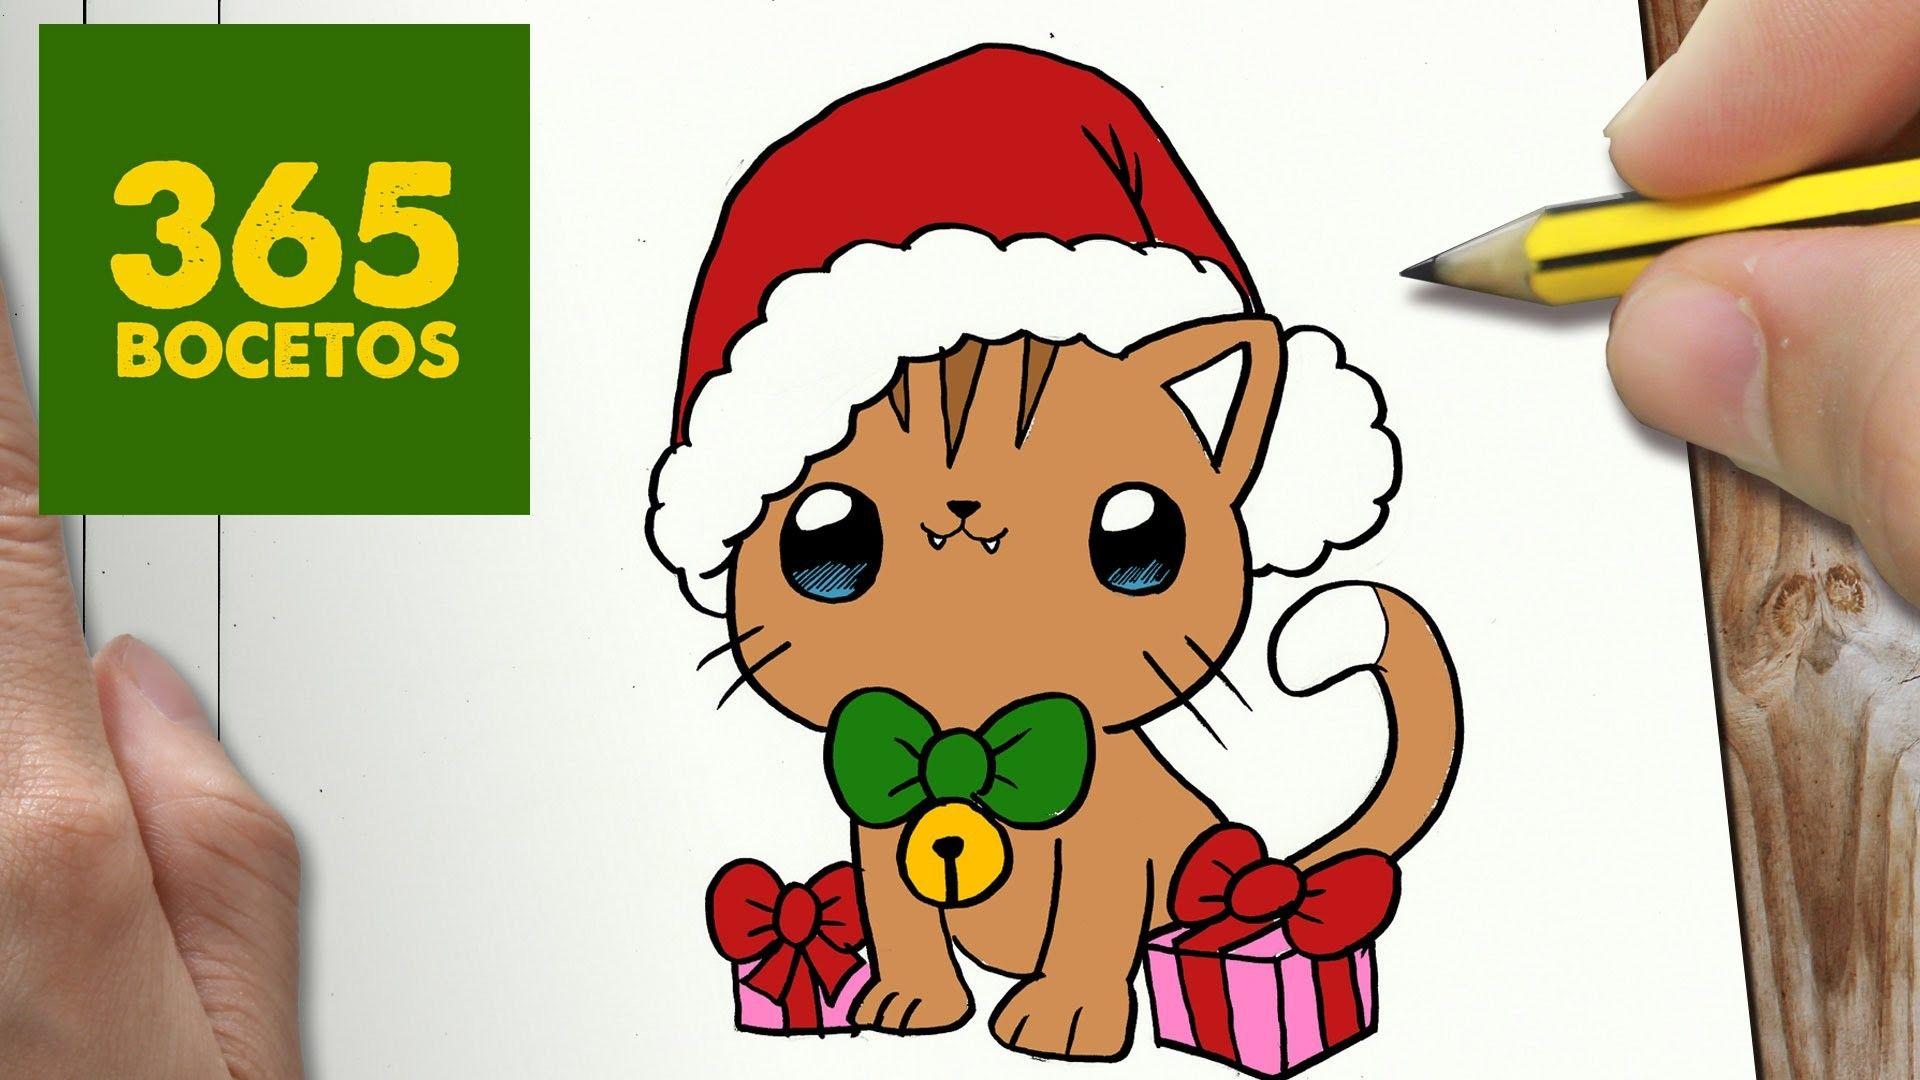 Como Dibujar Un Cuaderno Para Navidad Paso A Paso Dibujos: COMO DIBUJAR UN GATO PARA NAVIDAD PASO A PASO: Dibujos